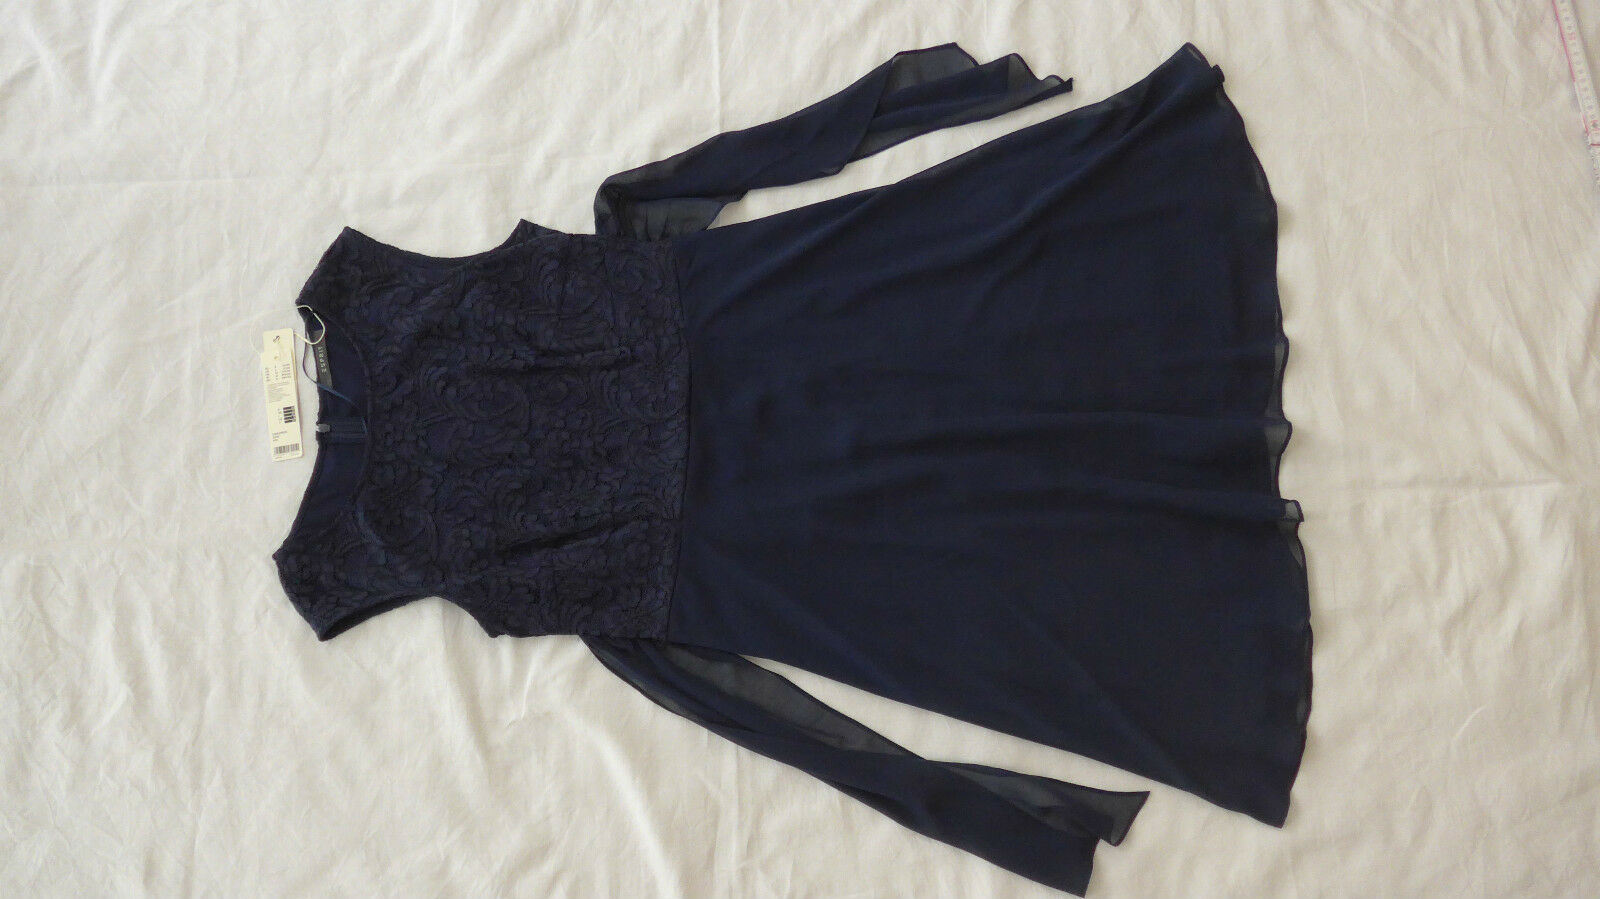 Blaues Etuikleid Etui Kleid Spitze elegant Esprit Größe 38 dunkelblau NEU